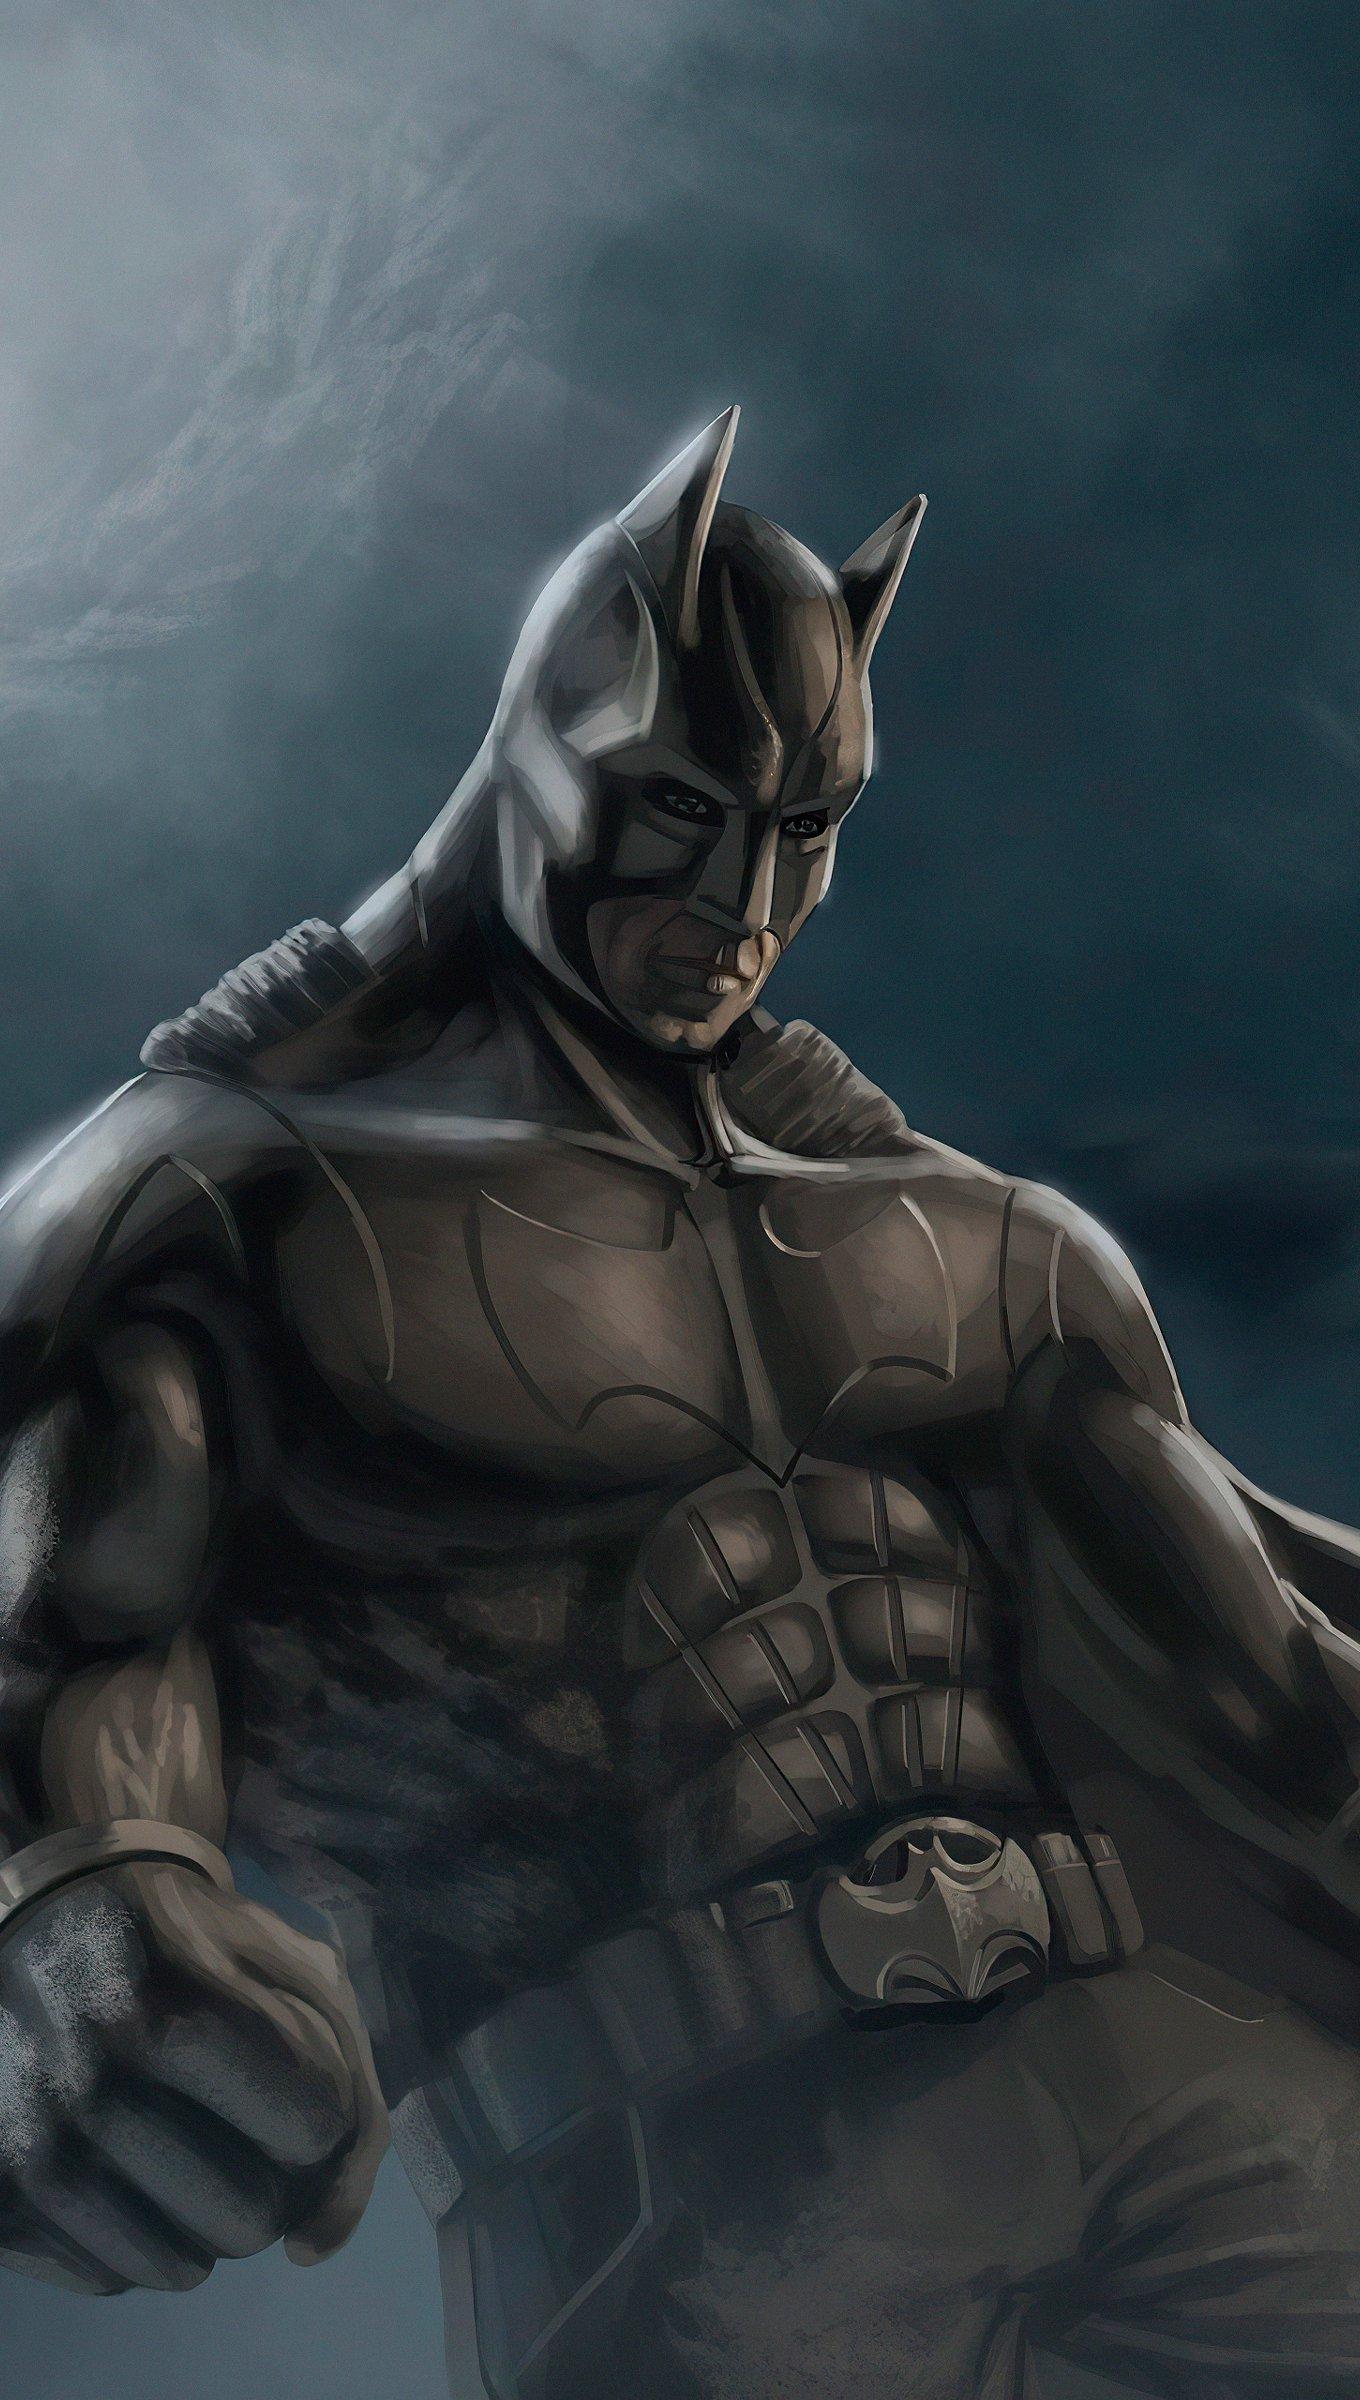 Fondos de pantalla Batman Newart Vertical